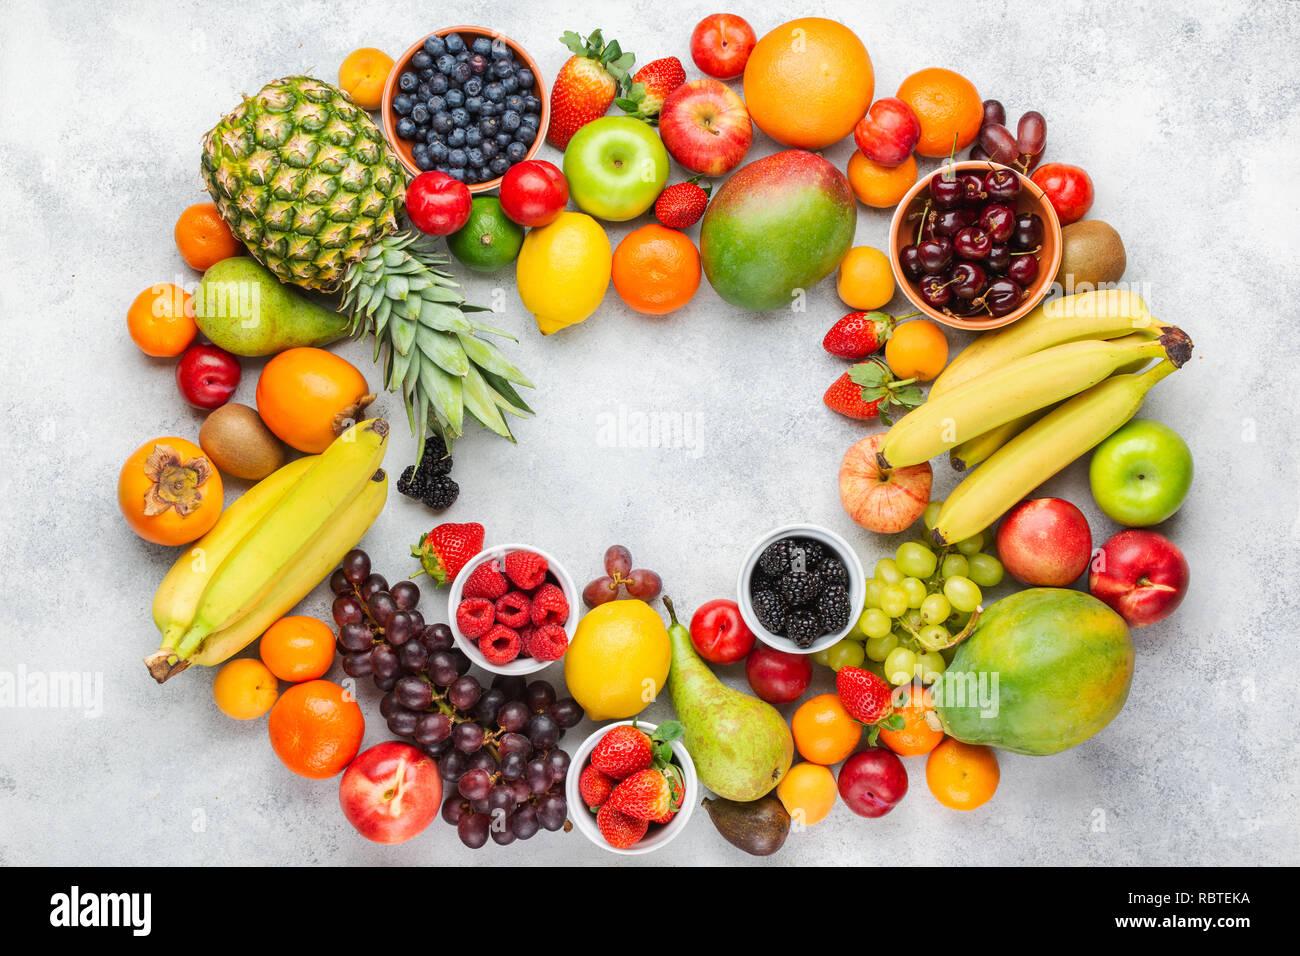 Rainbow fruits background frame, strawberries raspberries oranges plums apples kiwis grapes blueberries mango persimmon on white table, top view - Stock Image